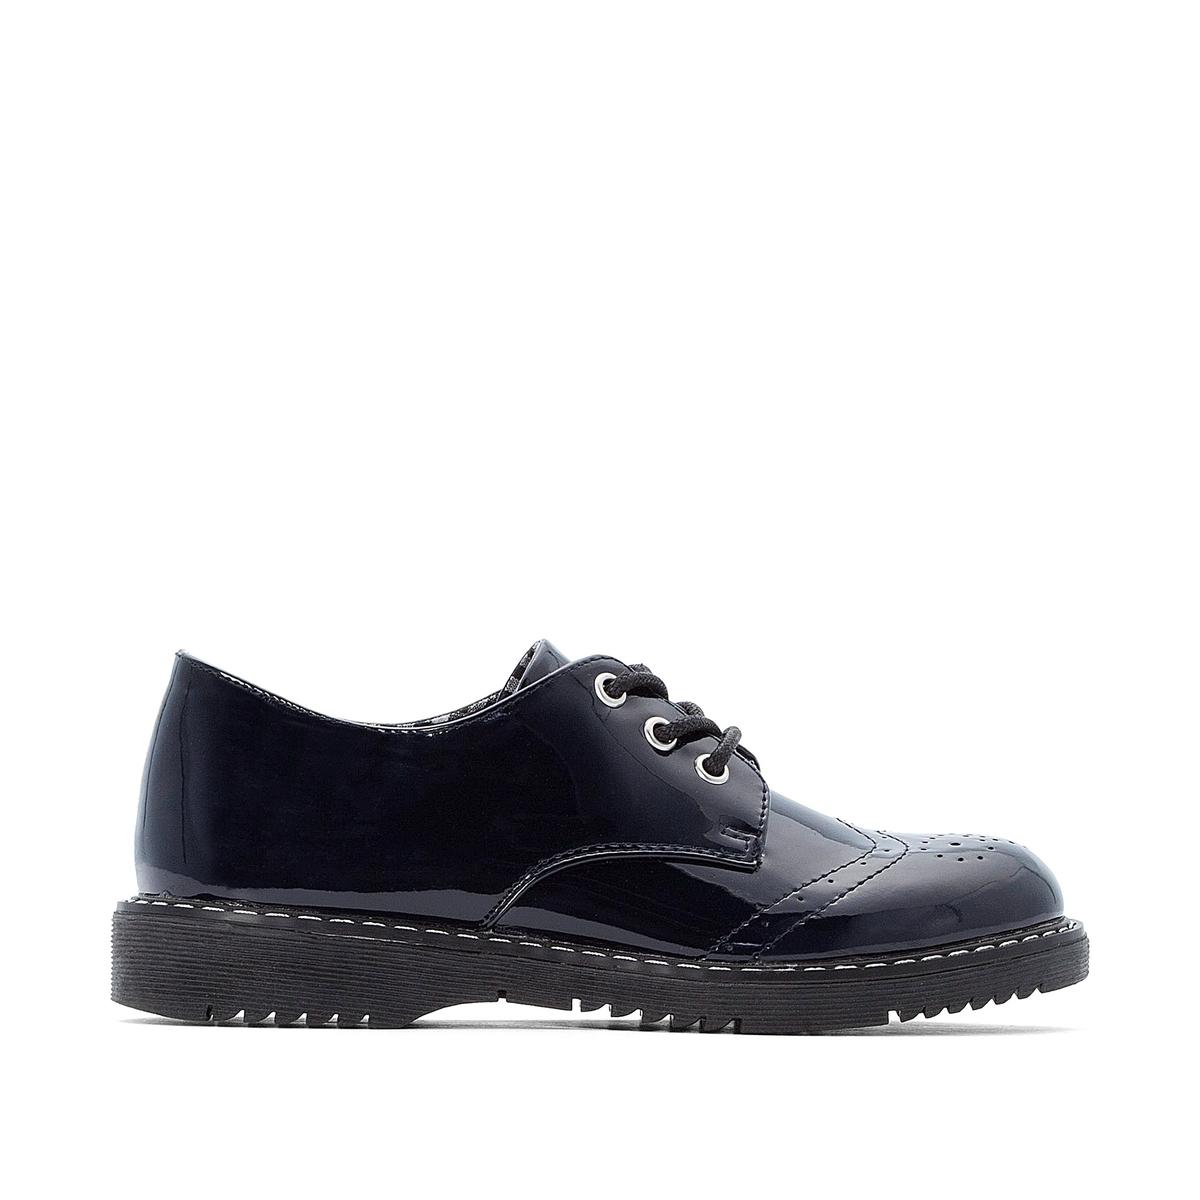 цена Ботинки-дерби La Redoute На шнуровке - 26 синий онлайн в 2017 году